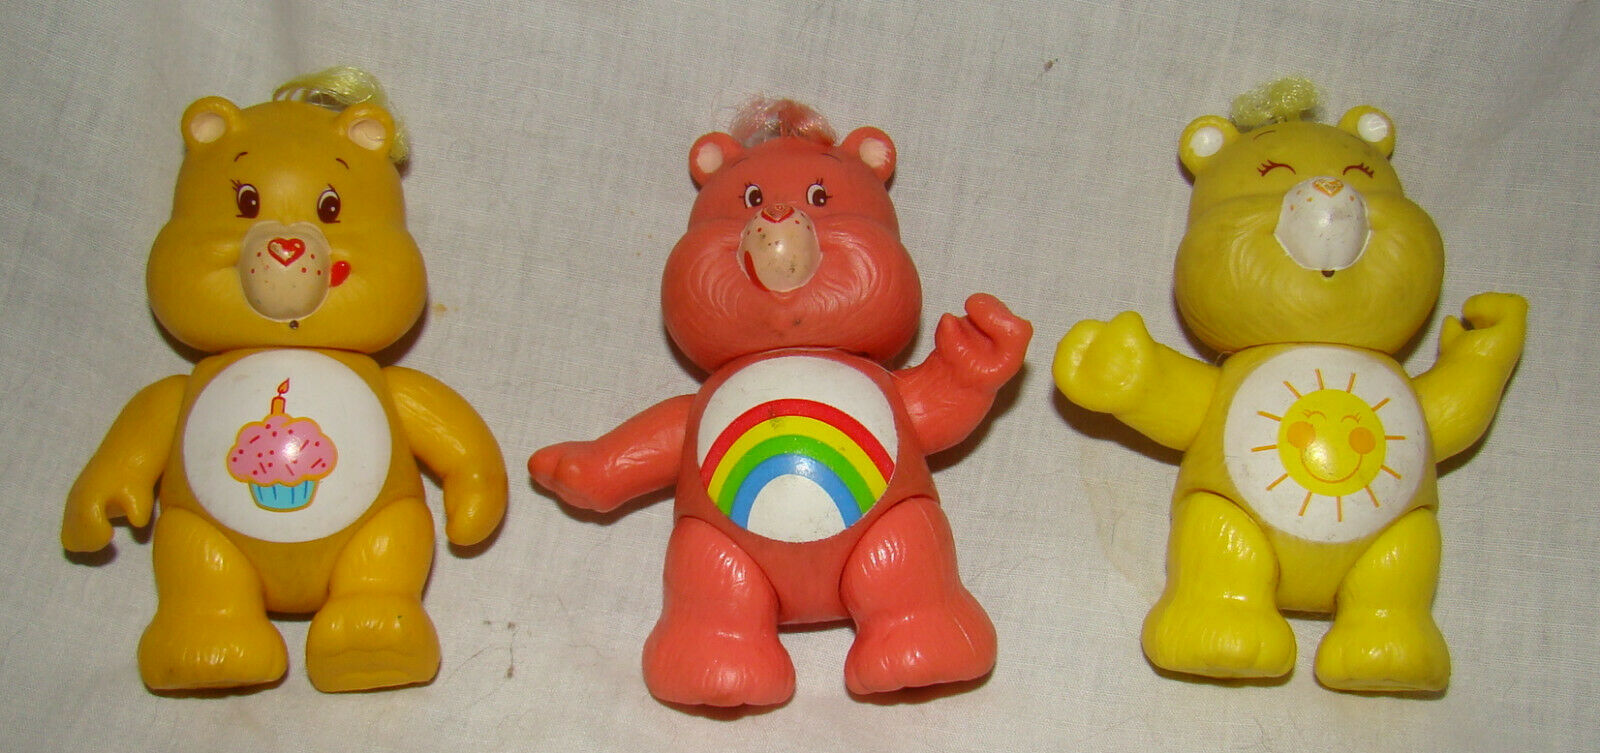 Vtg CARE BEARS Action Figures PVC Soft Plastic Lot 3 Birthday Cheer Funshine - $6.00